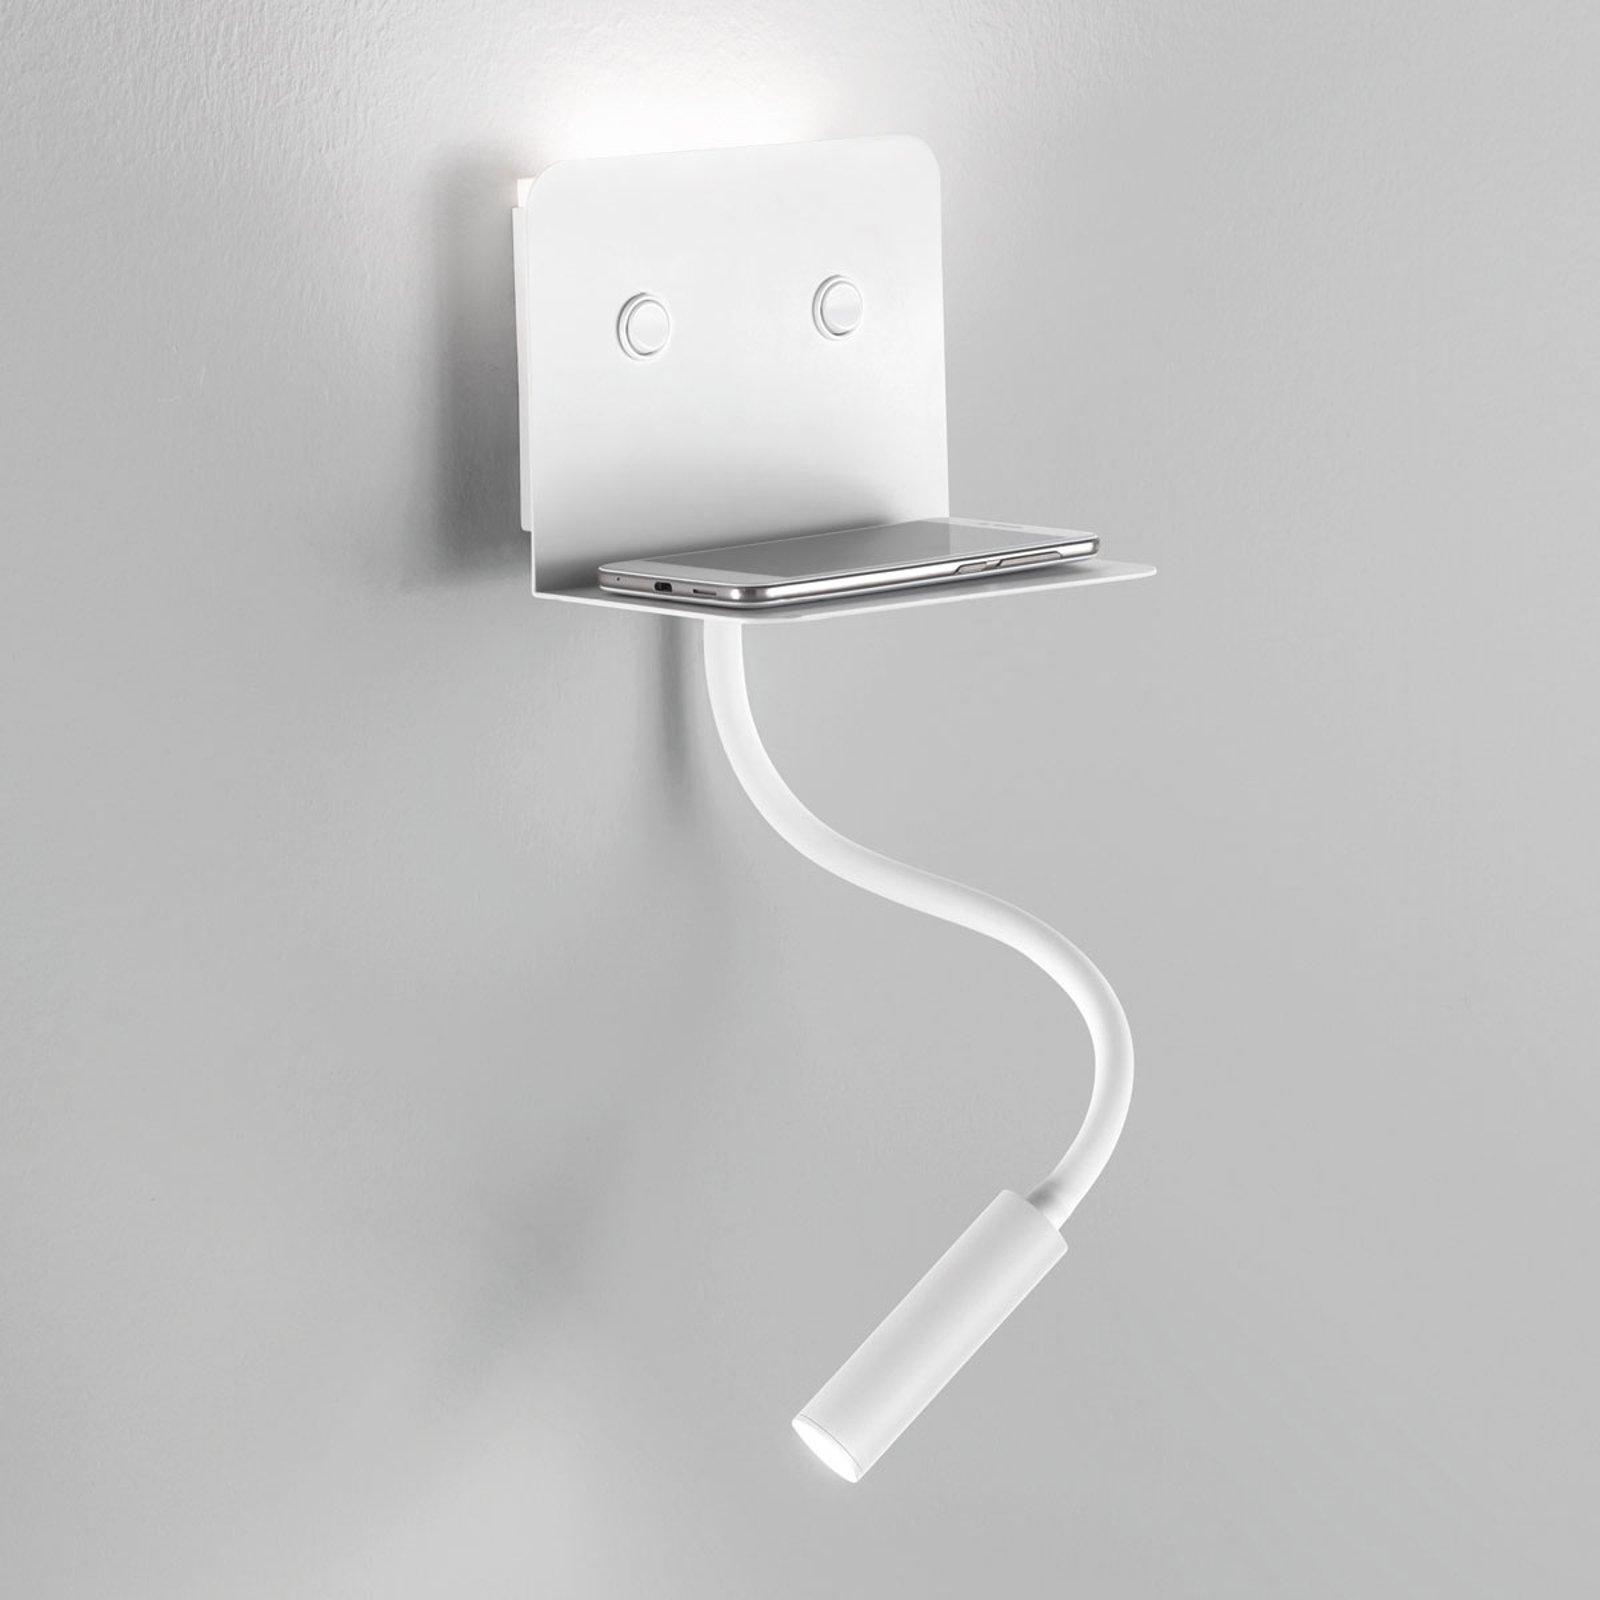 LED-vegglampe Level med skuff og leselys